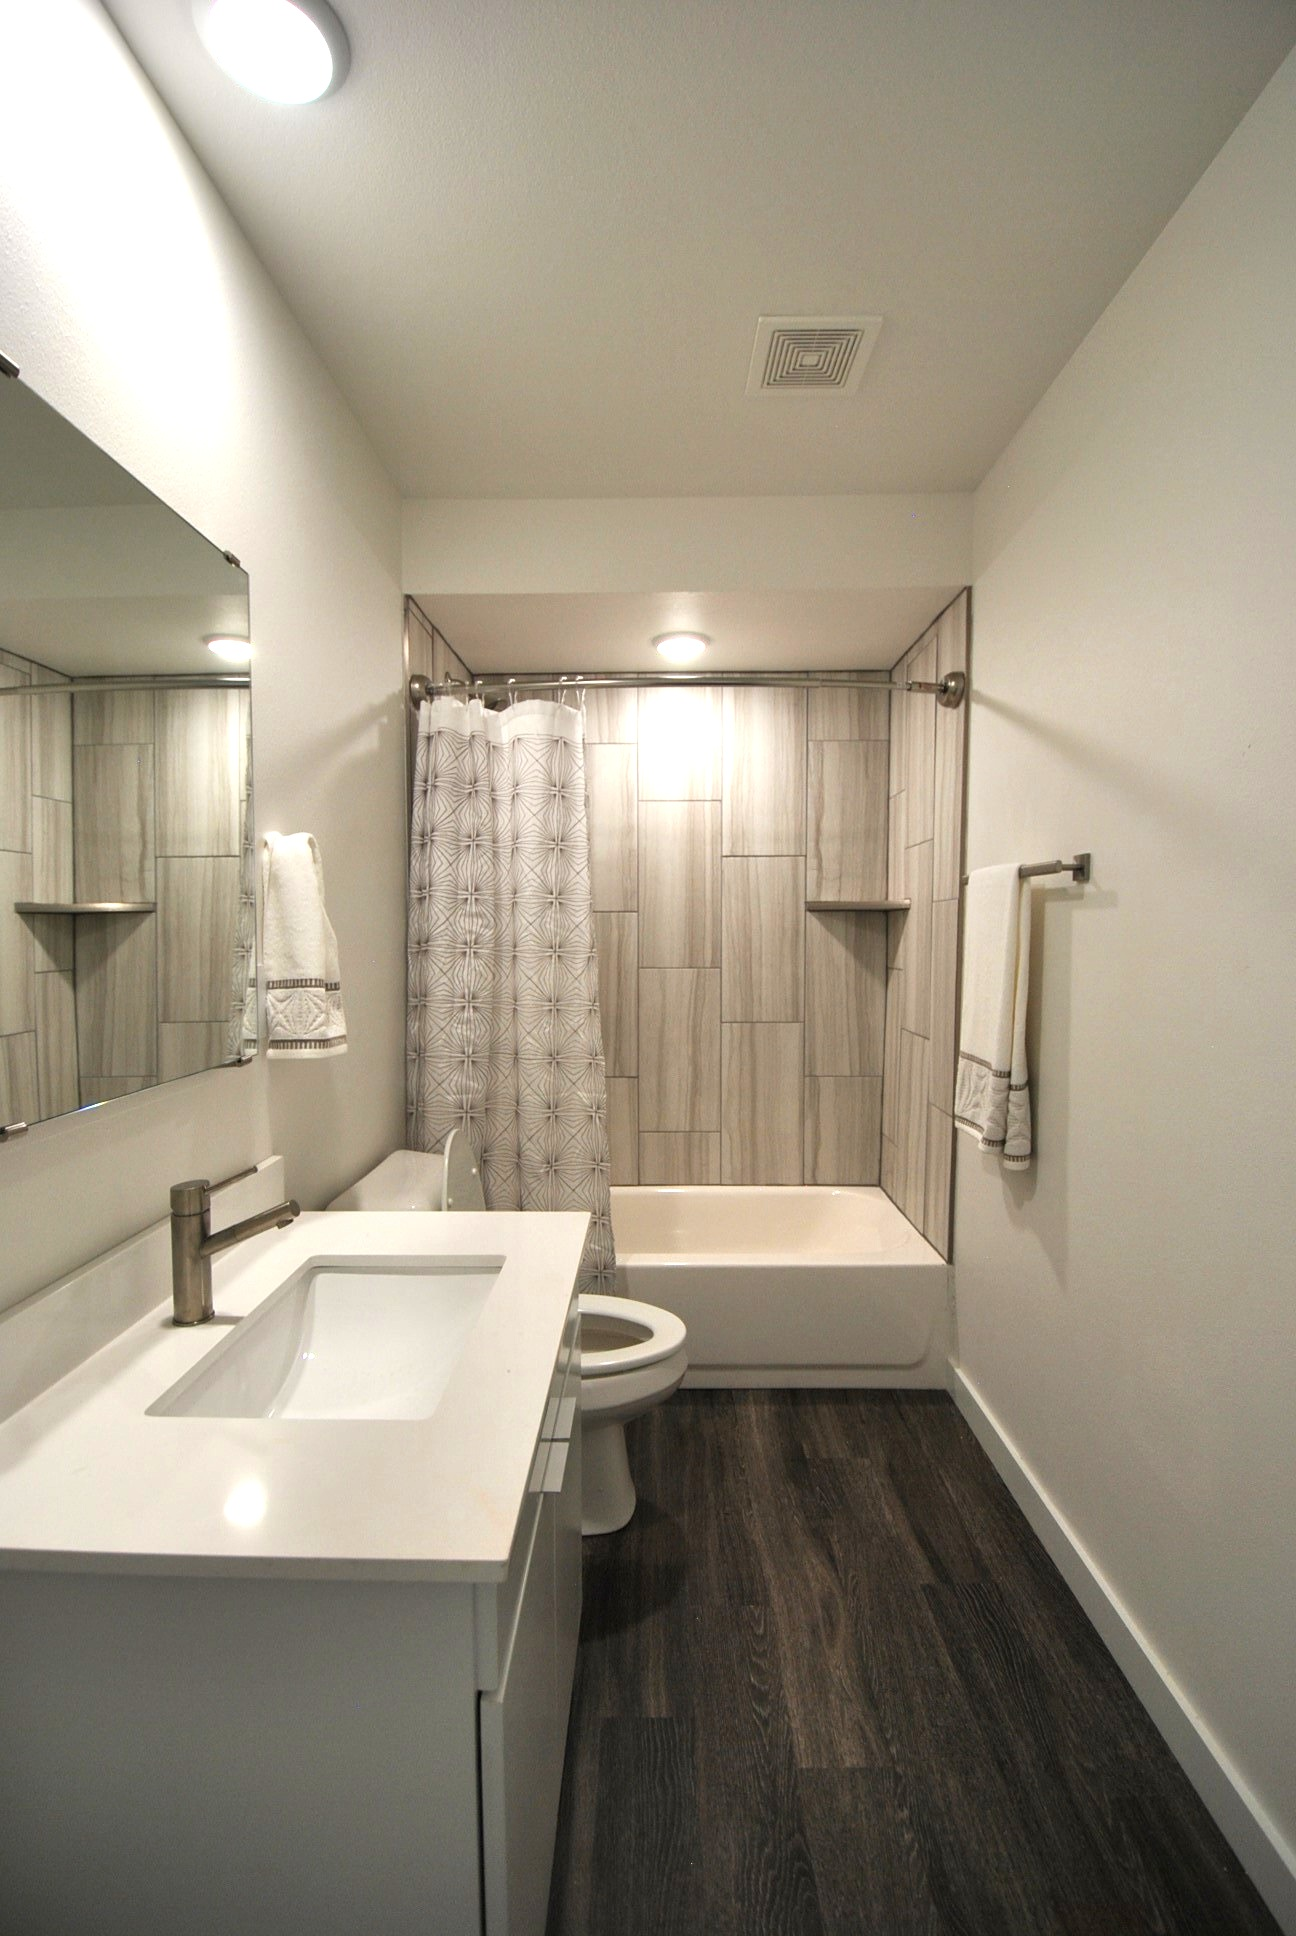 bathroominterior.jpg